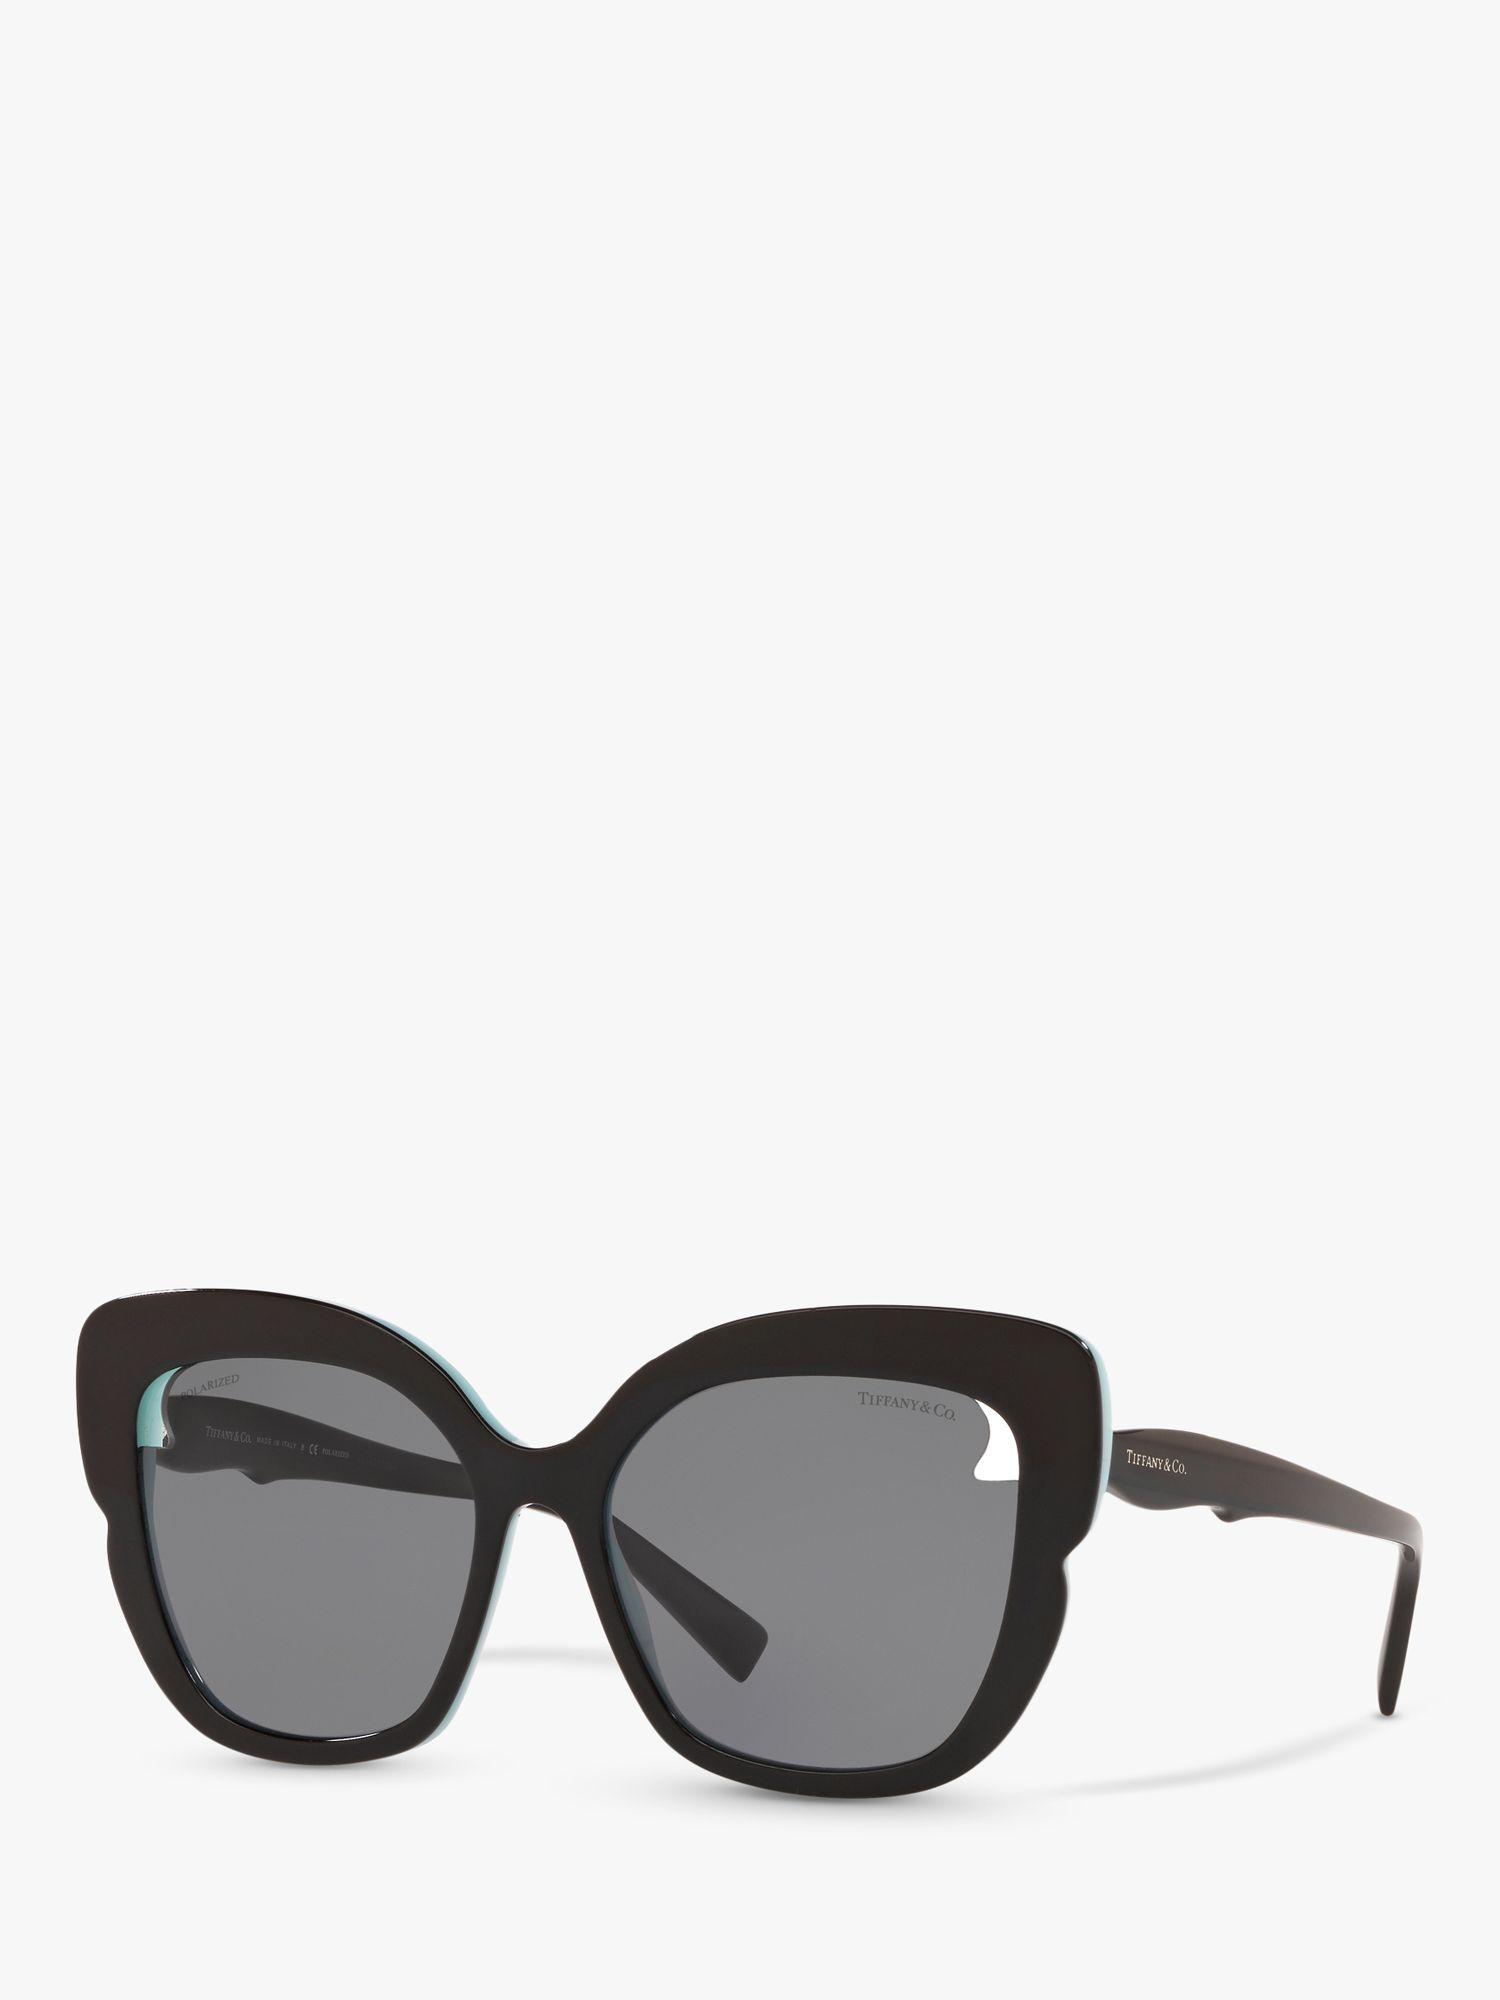 Tiffany & Co Tiffany & Co TF4161 Women's Polarised Square Sunglasses, Black